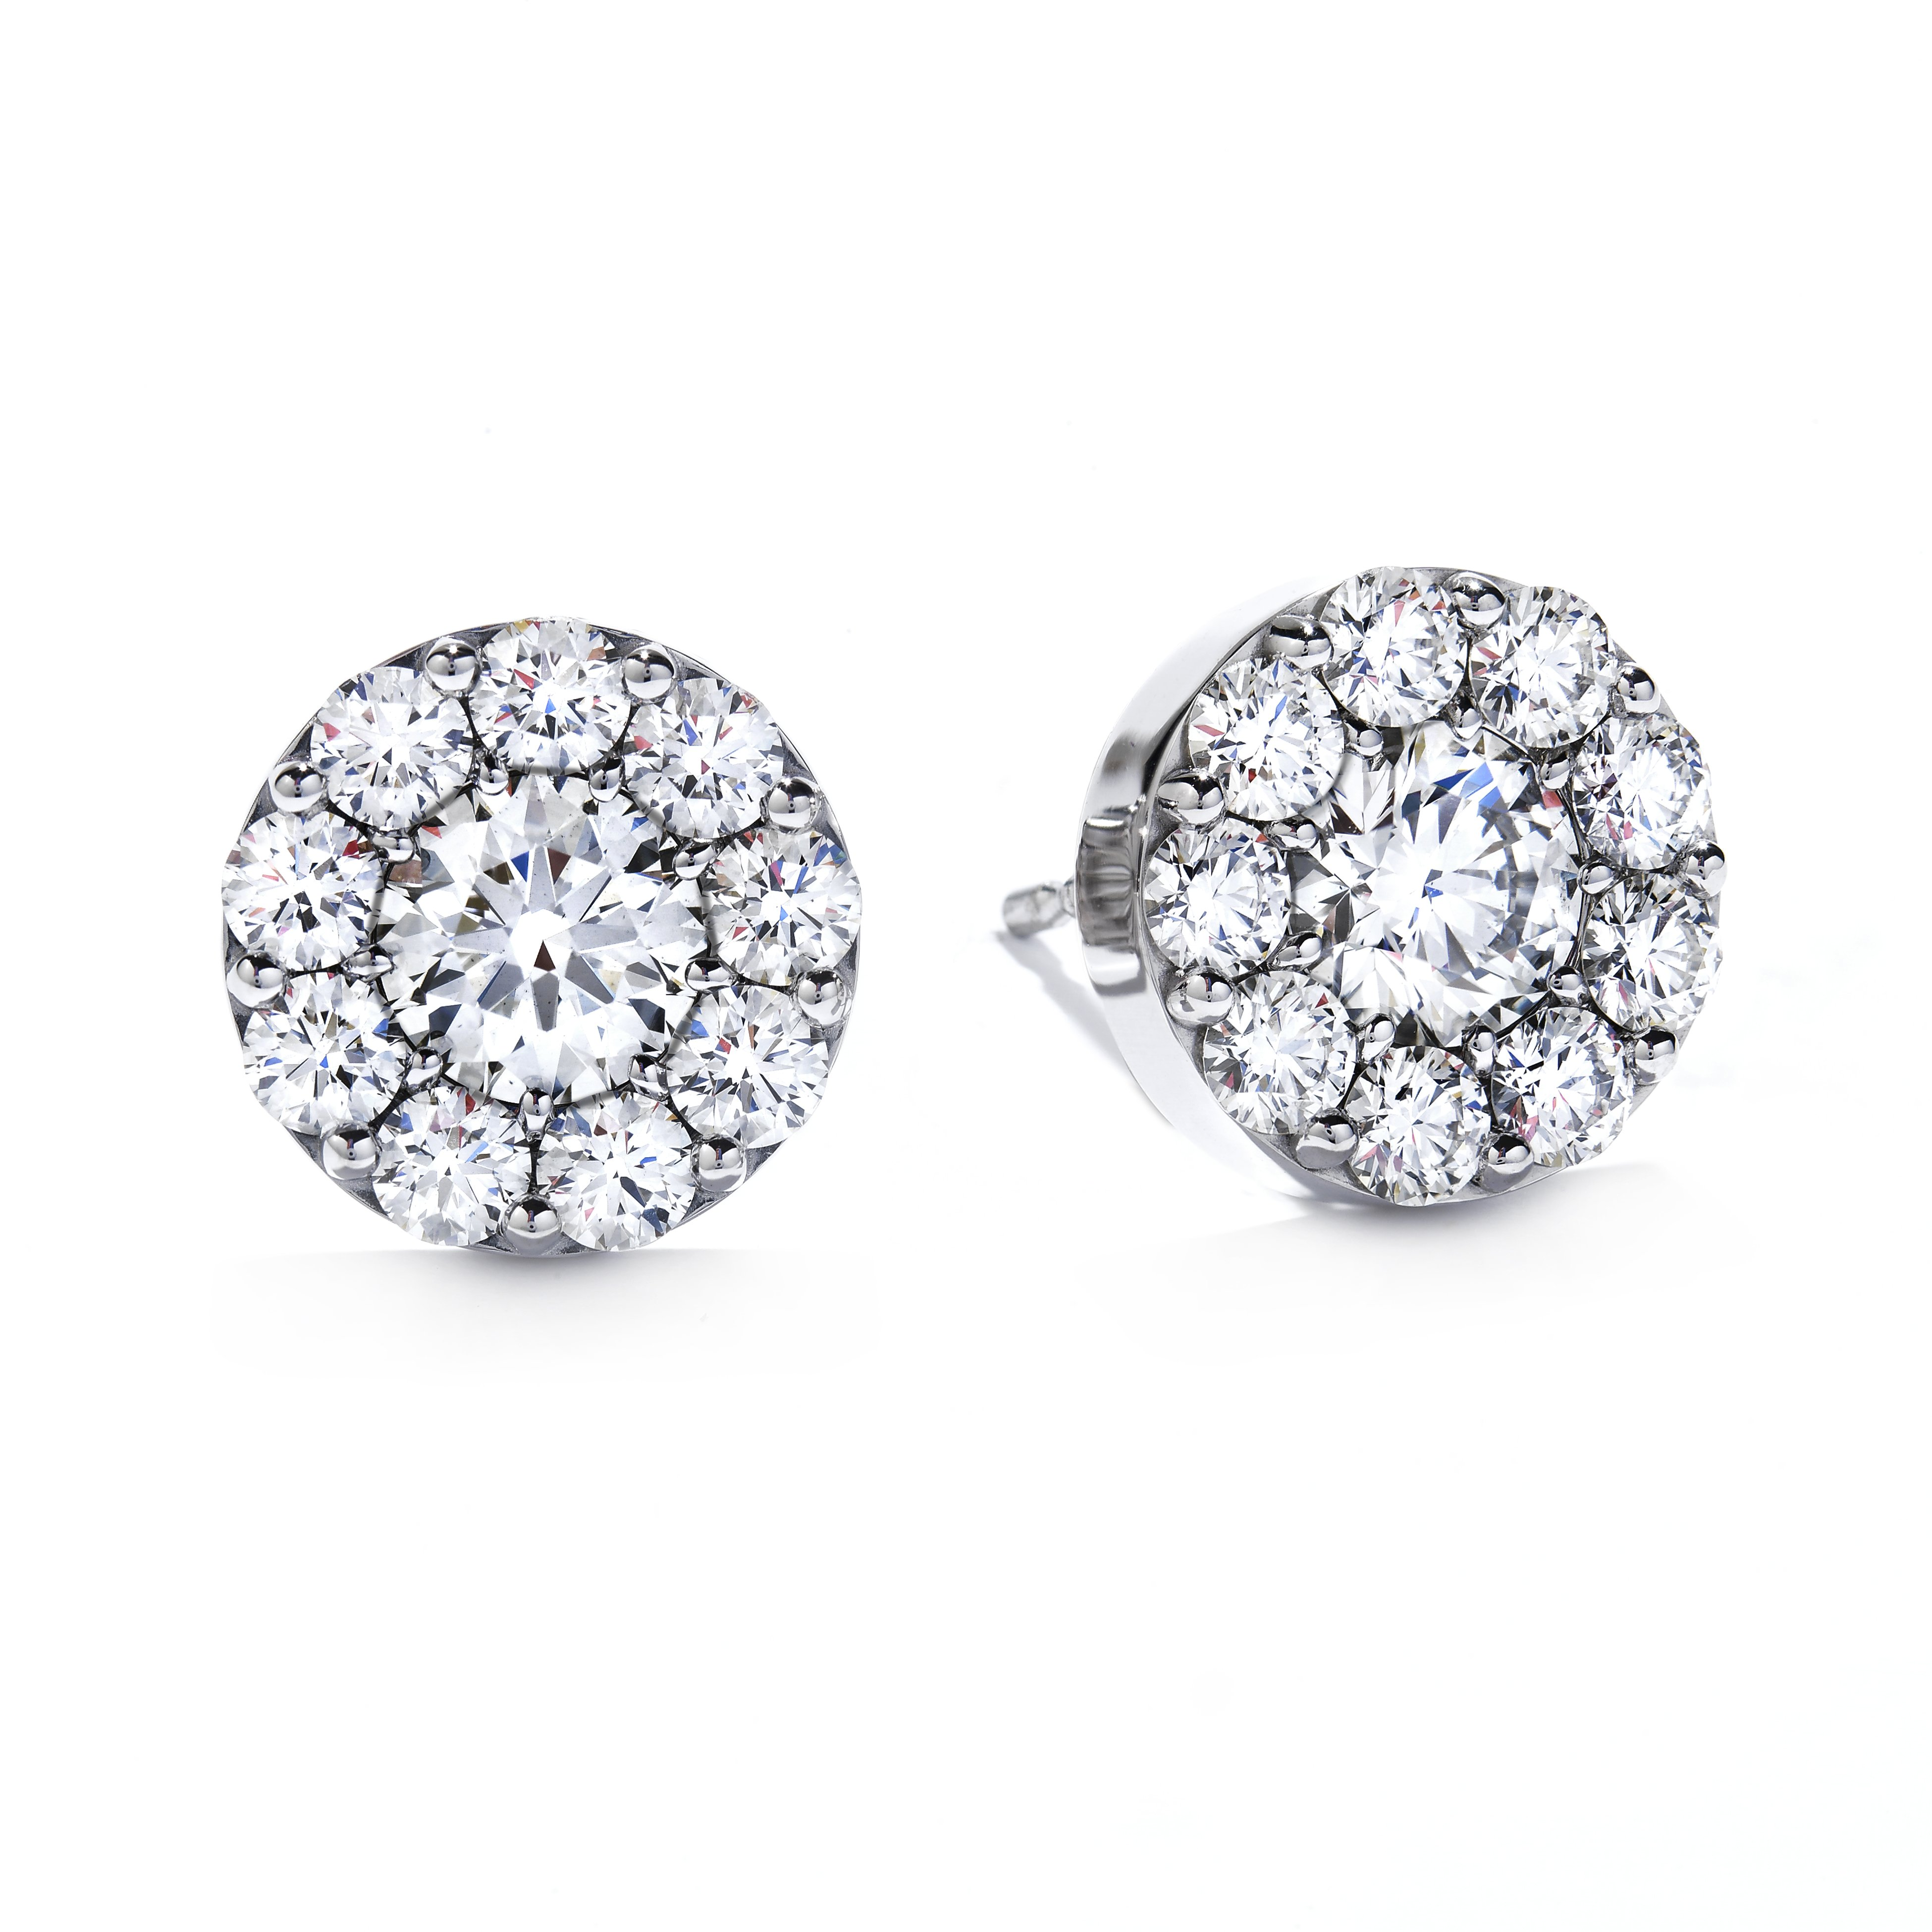 3ad4dbd9e Hearts On Fire 18K - White Gold Diamond Earrings Fulfillment Round ...